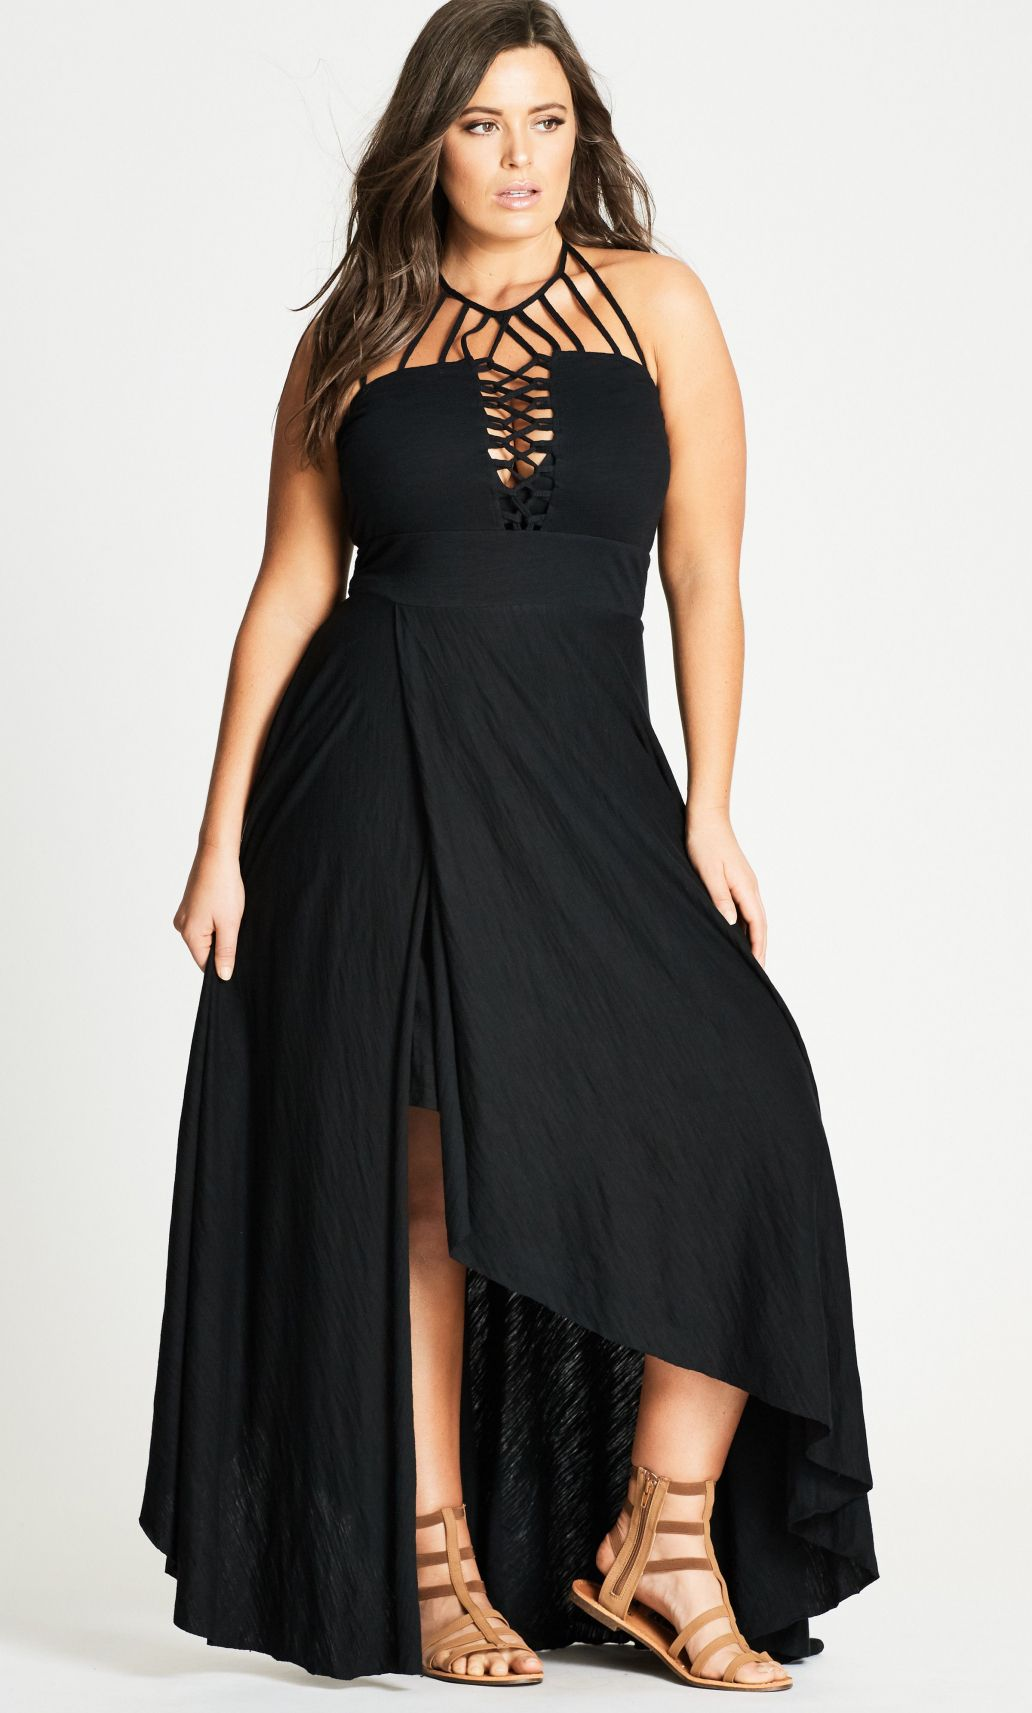 luxus-elegante-outfits-fur-mollige-plus-size-maxi-dress-plus